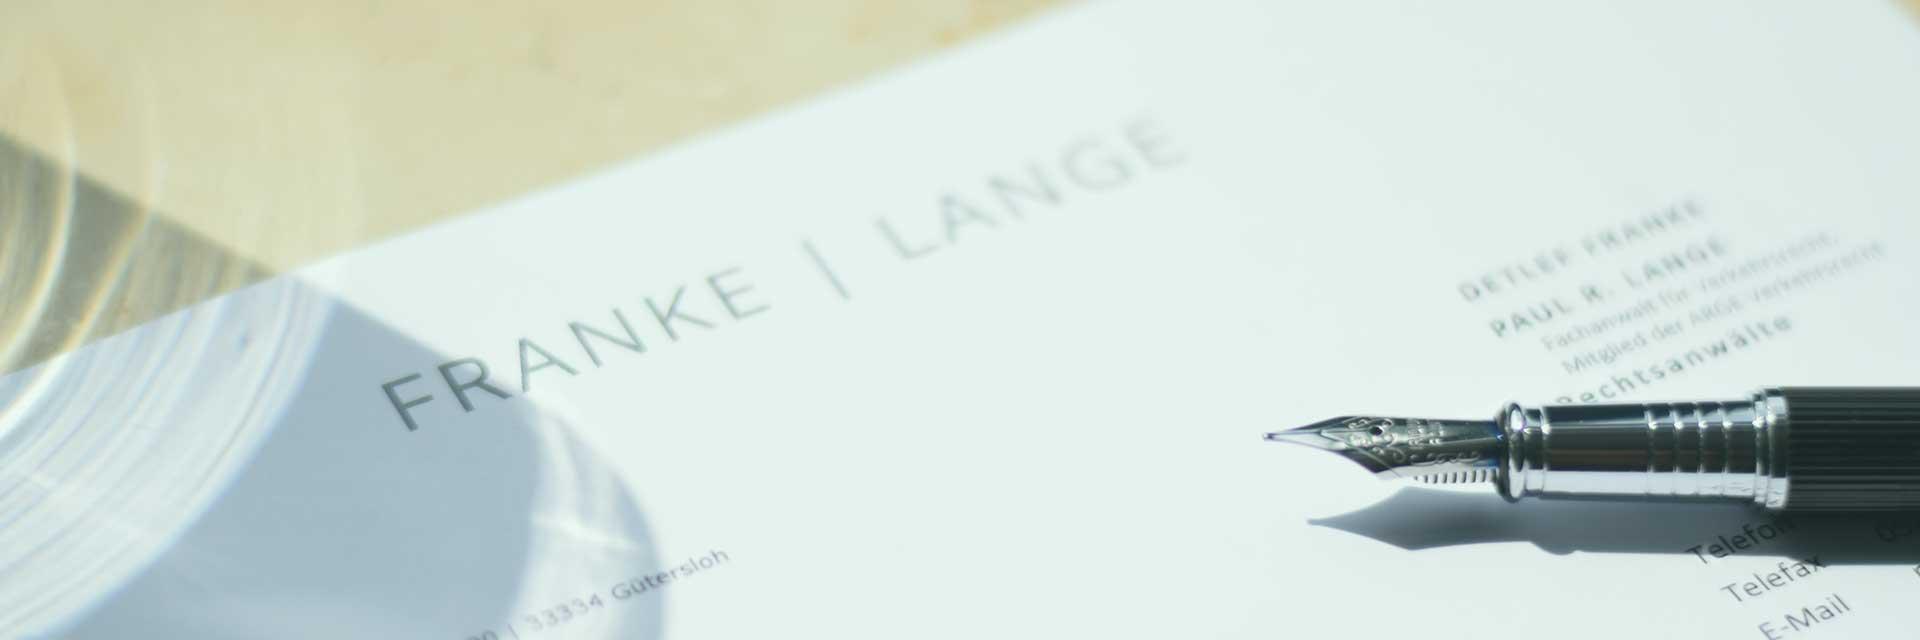 Corporate Design für Anwaltskanzlei in Bieleld